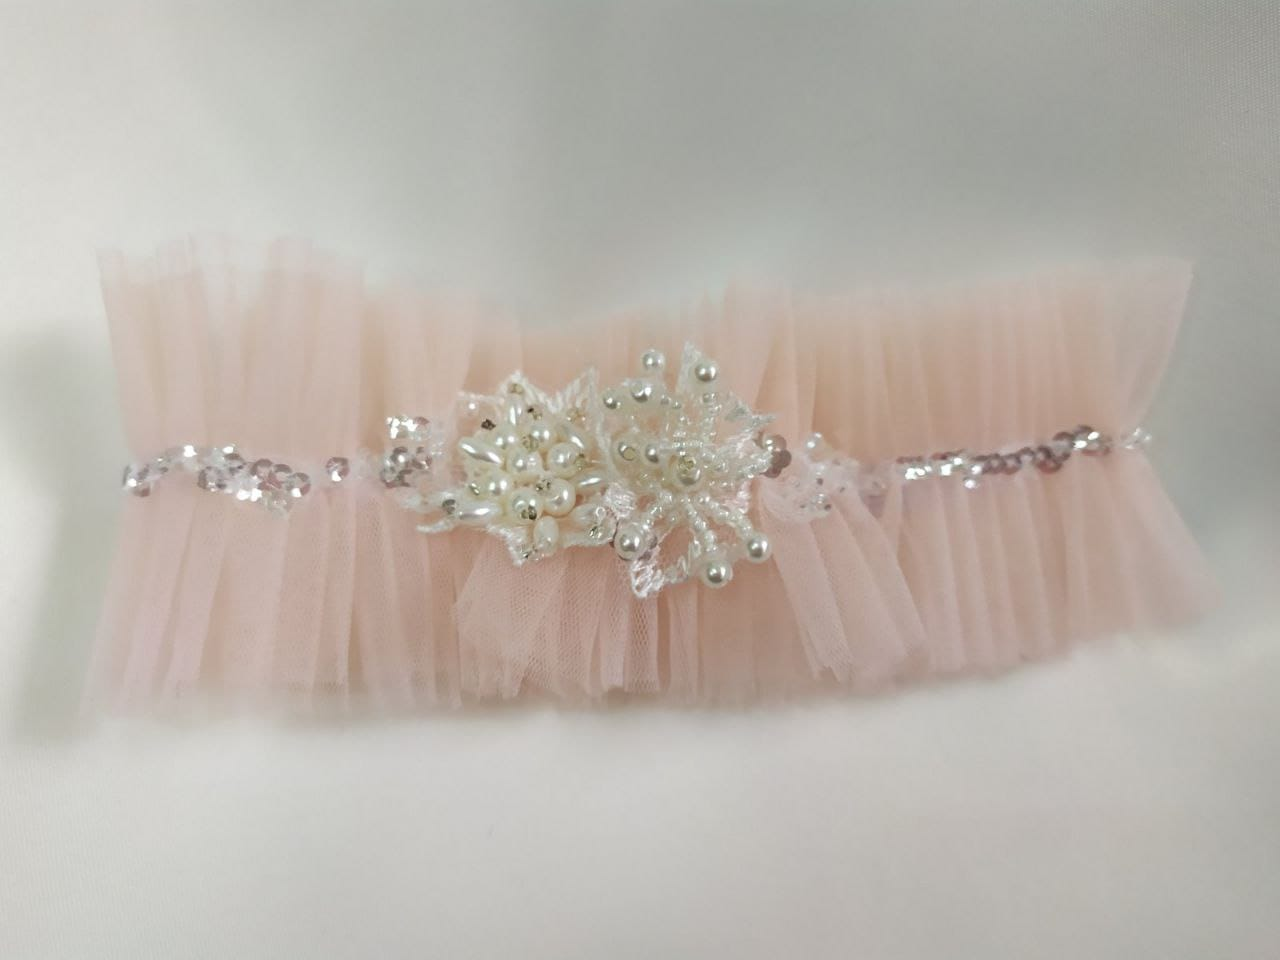 Розовая свадебная подвязка, артикул 36400003, фото №4